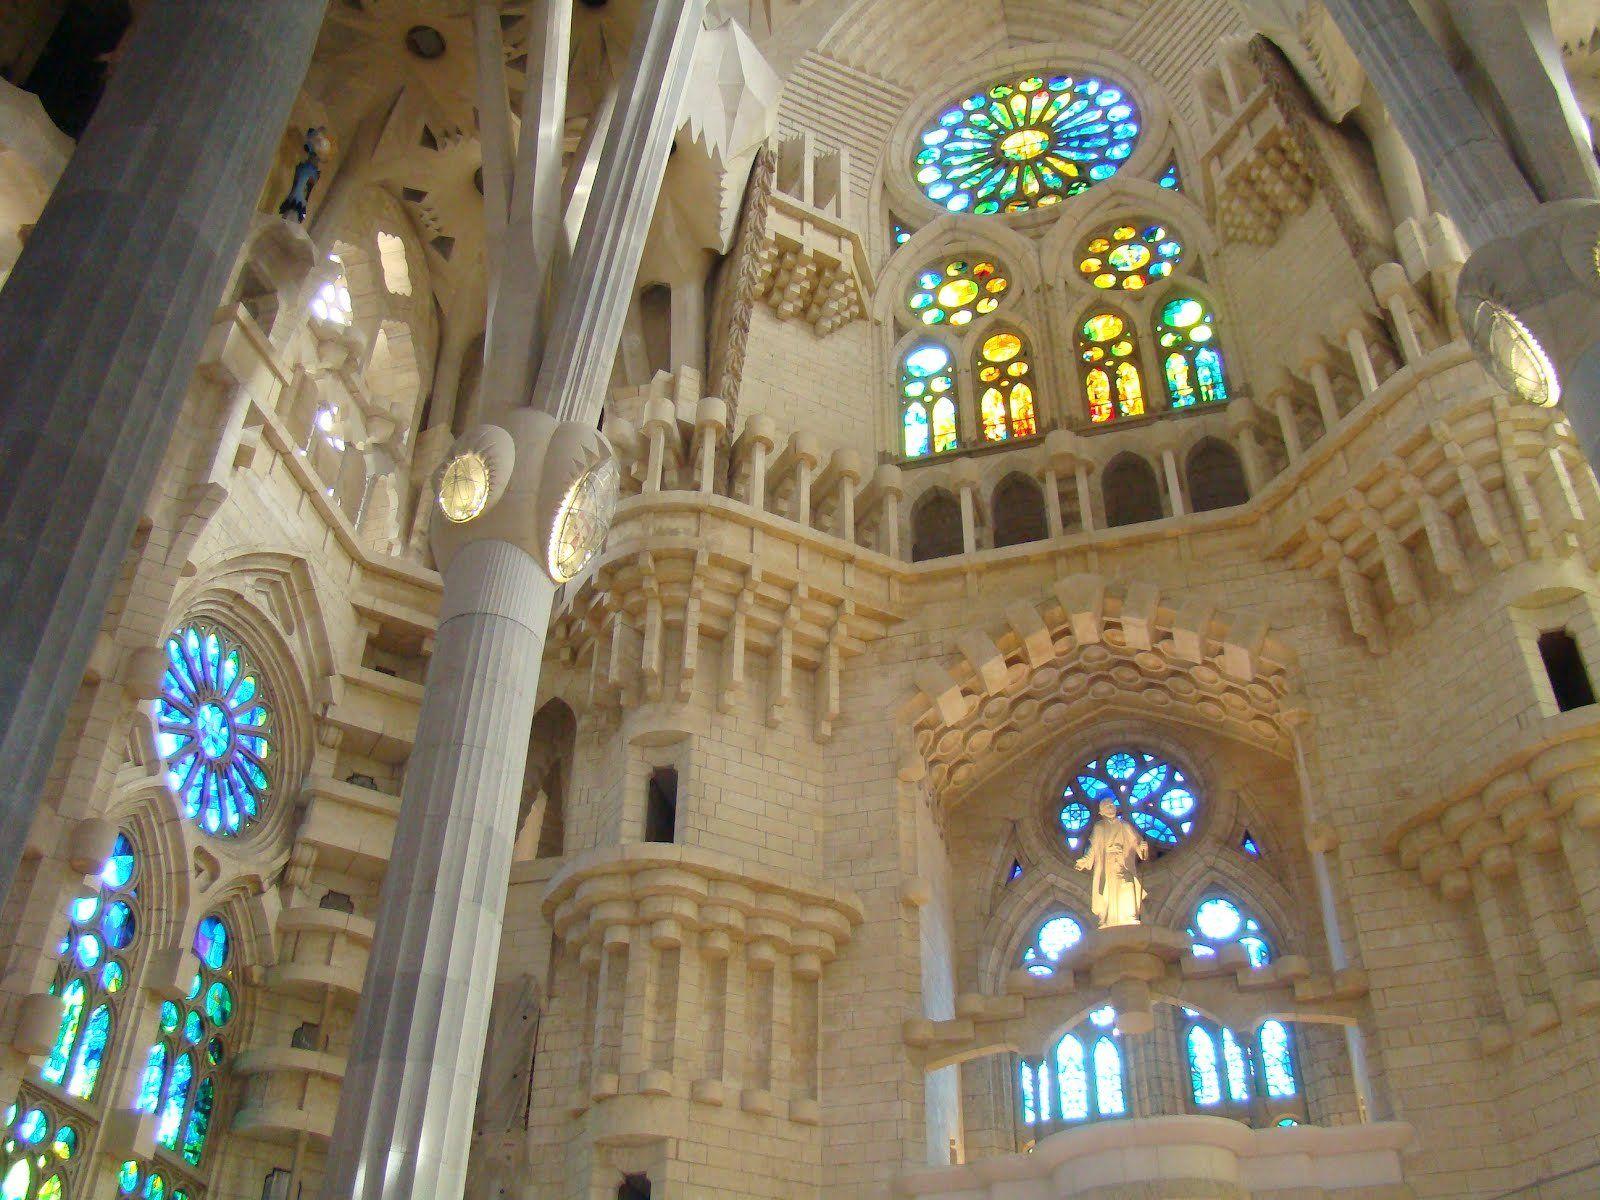 Interior Del Templo Sagrada Familia Http Arteameno Blogspot Com 2013 06 Antonio Gaudi La Sagrada Sagrada Familia Interior Gaudi La Sagrada Familia Barcelona